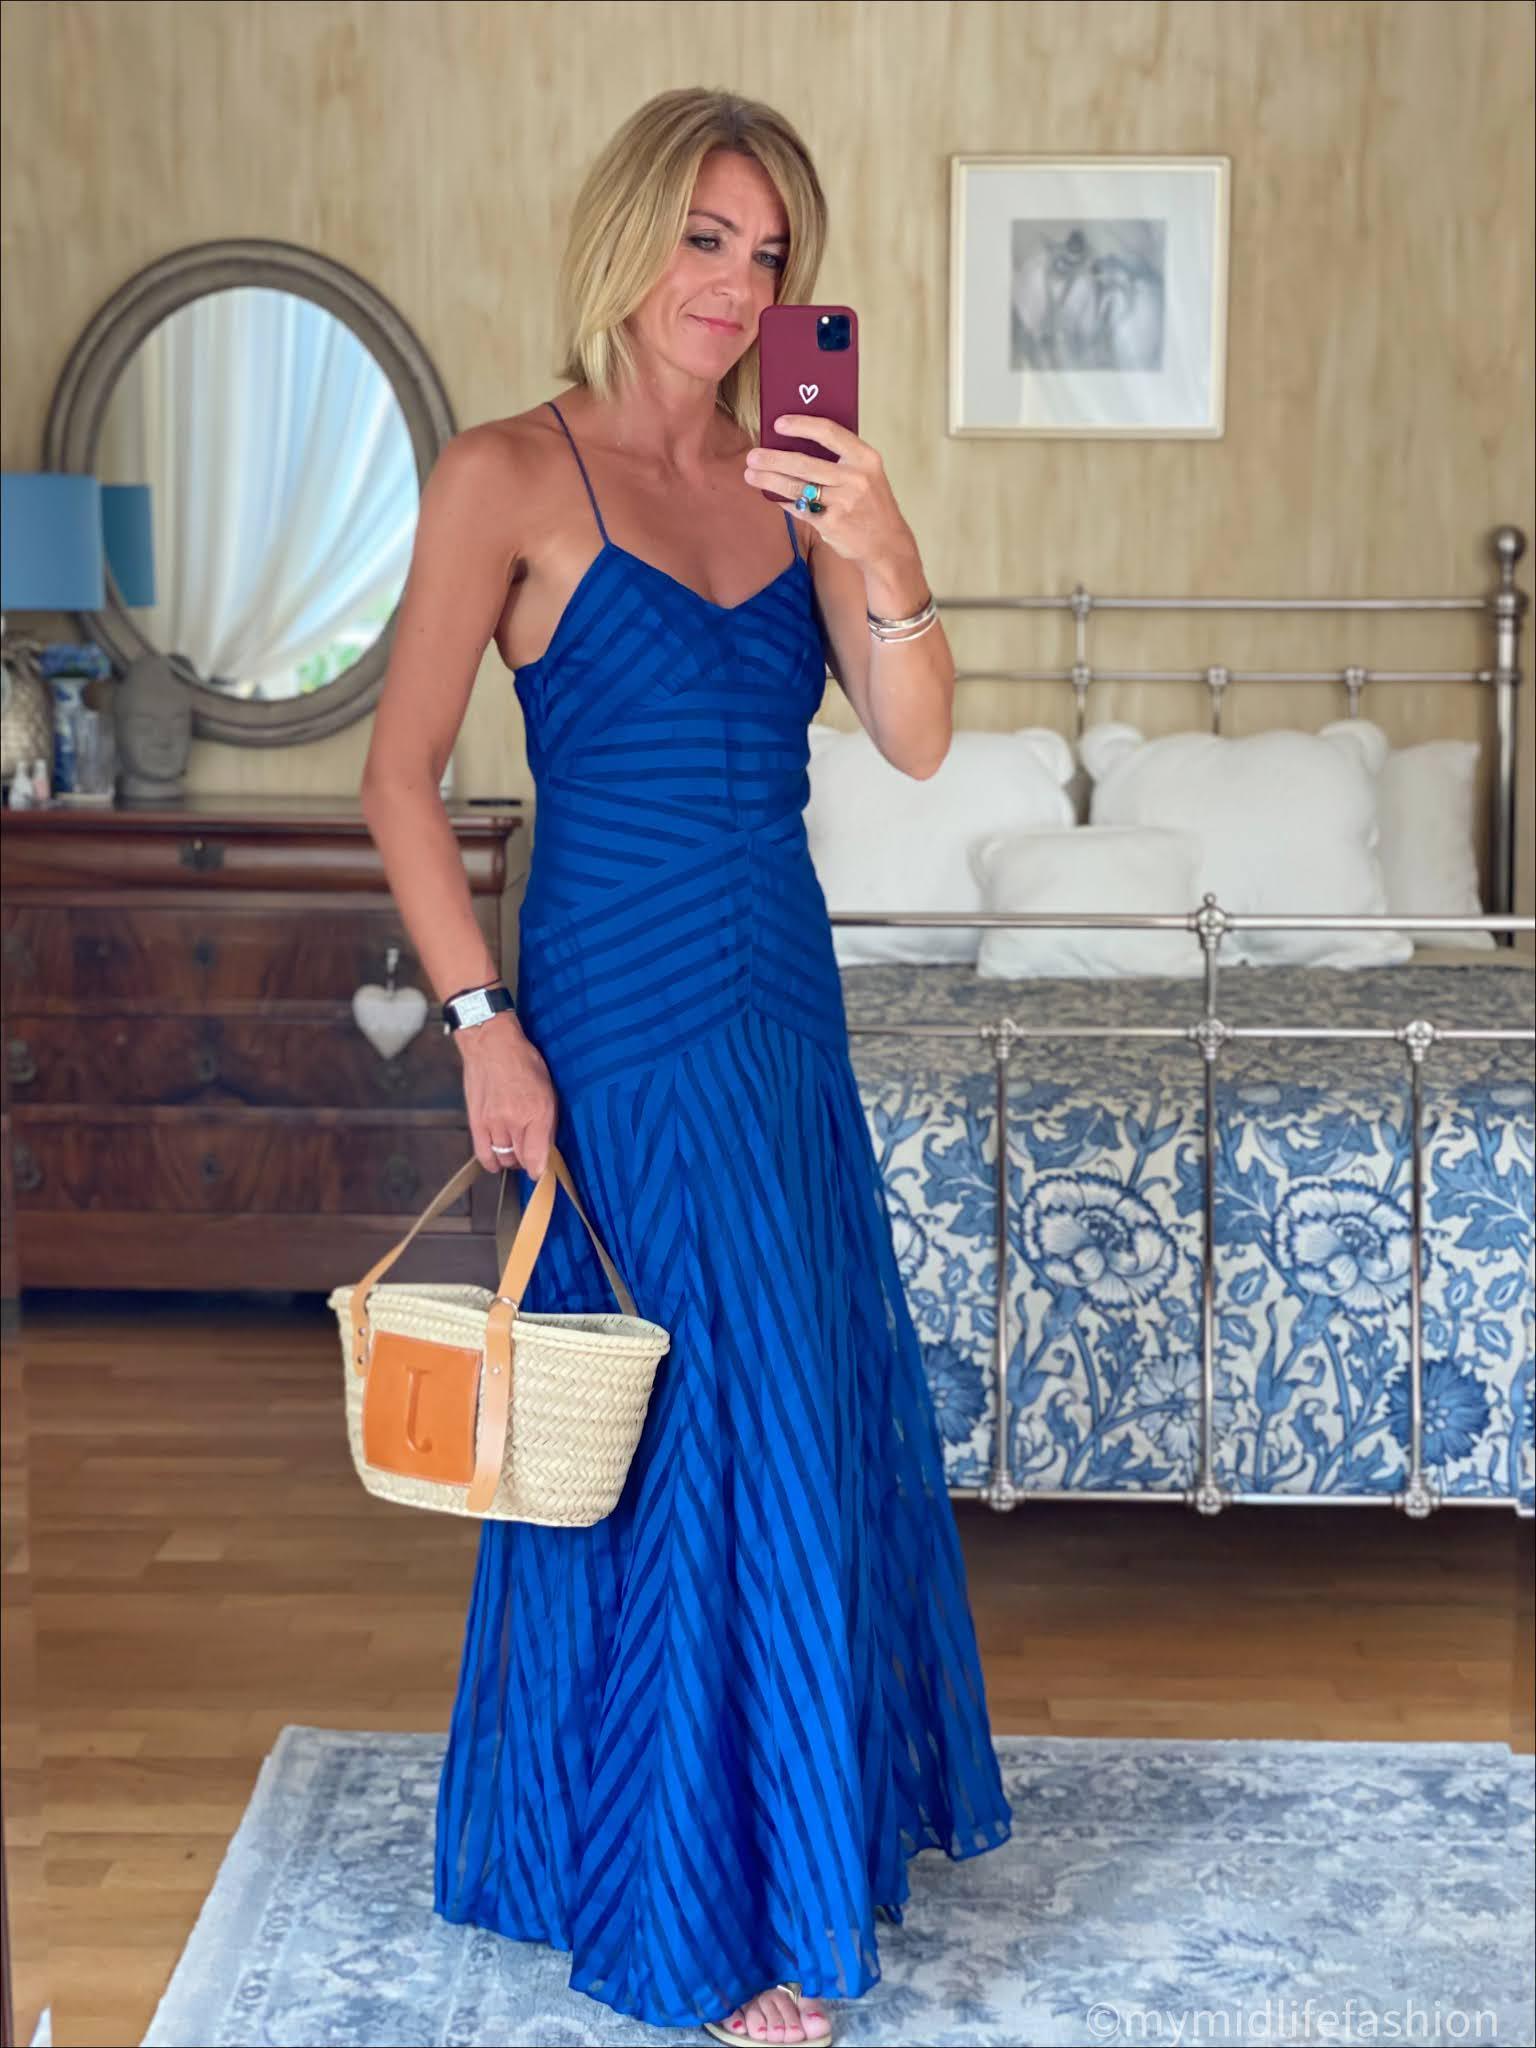 Royal blue spaghetti strap maxi dress, havaianas slim fit gold flip flops, Lada jewellery basket, my midlife fashion